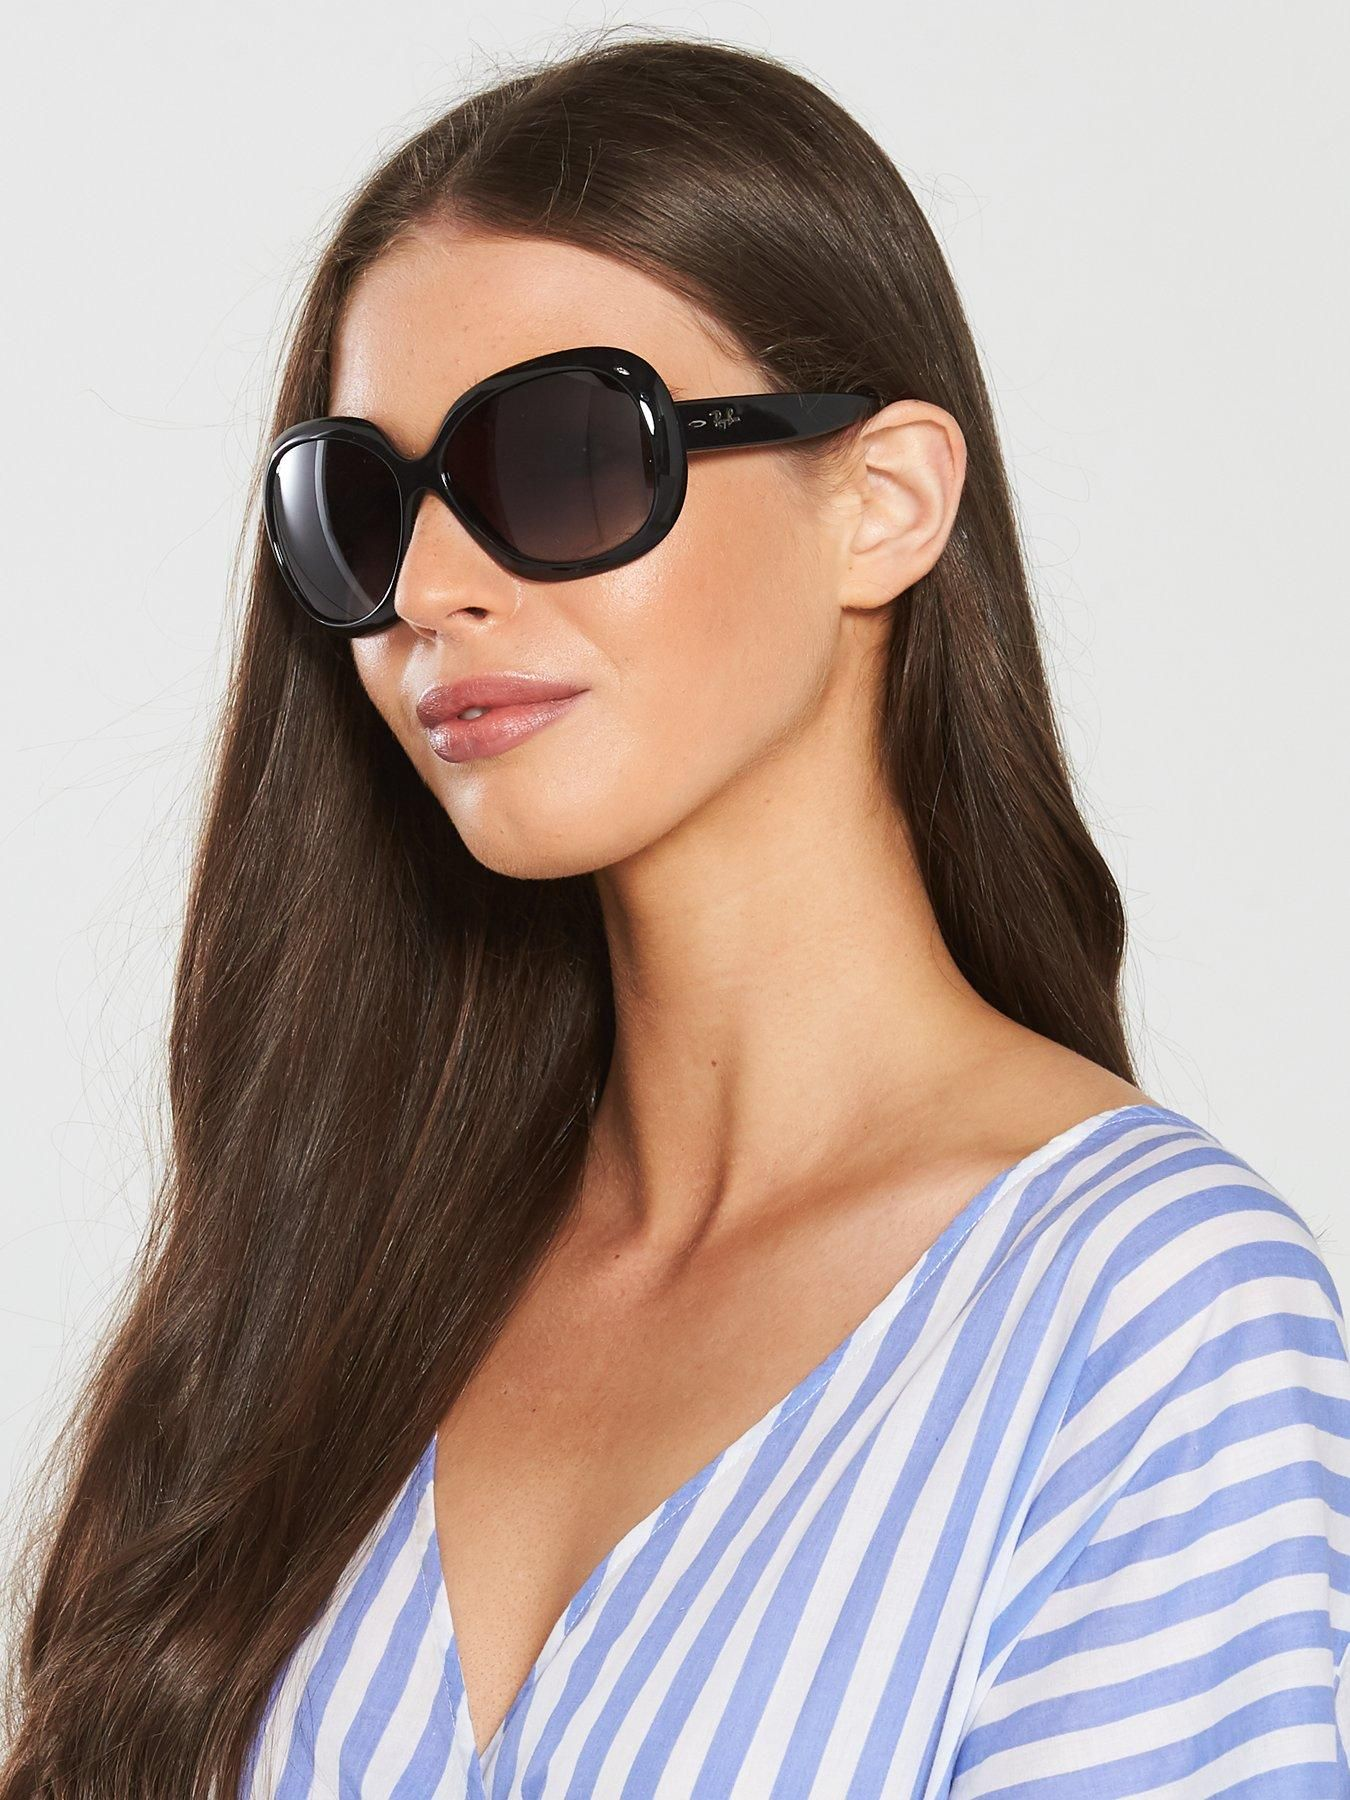 Rayban Jackie Ohh Ii Black Butterfly Sunglasses Butterfly Sunglasses Ray Ban Sunglasses Women Black Butterfly